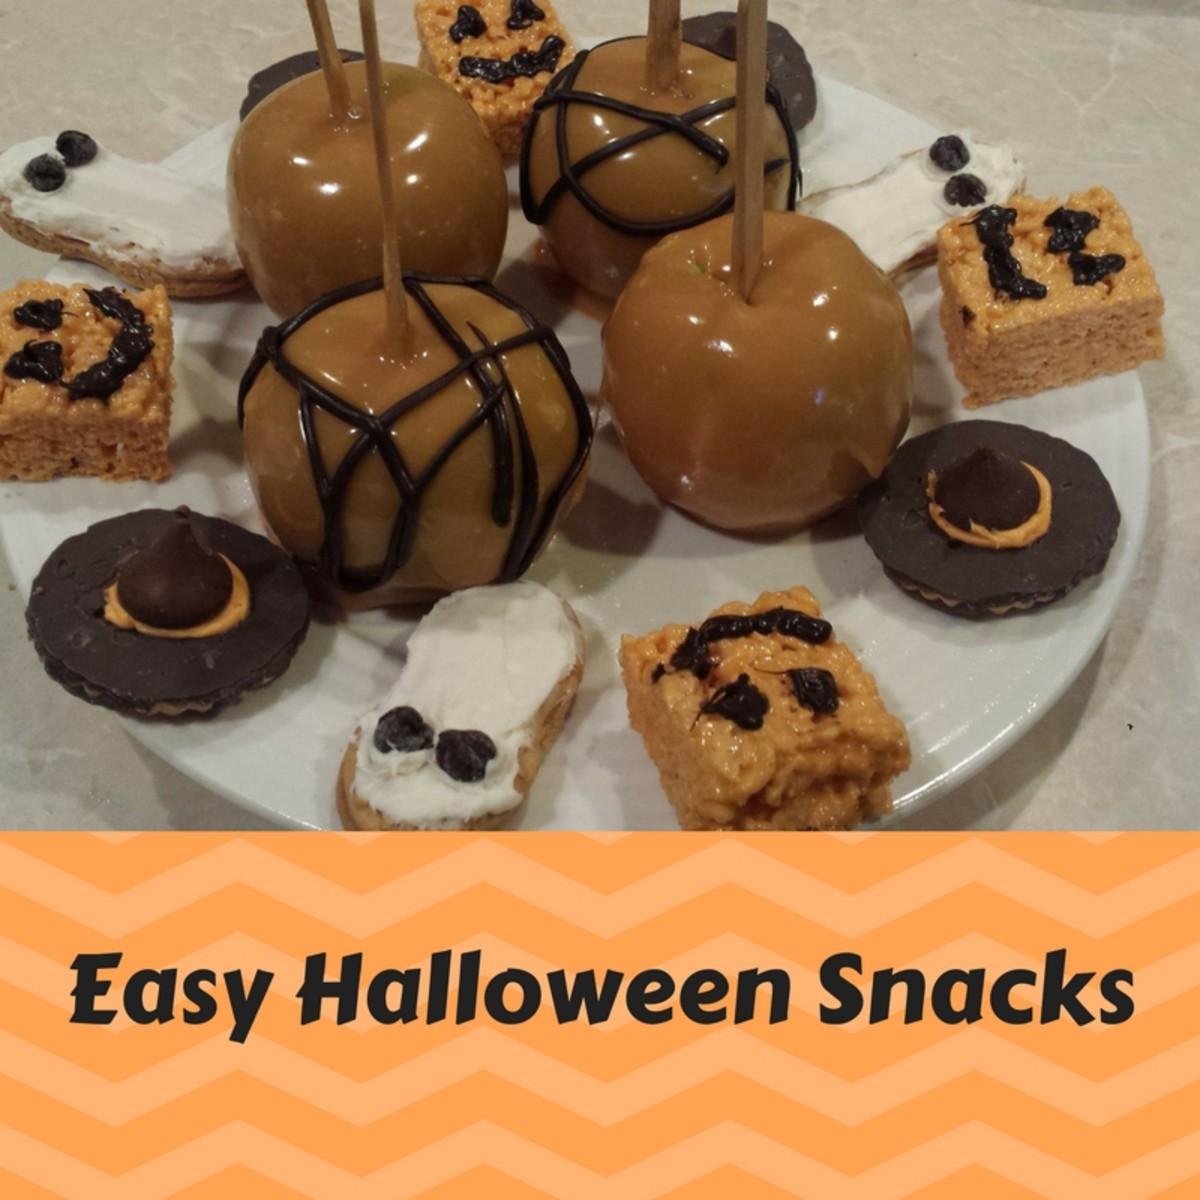 10 Easy Halloween Snacks